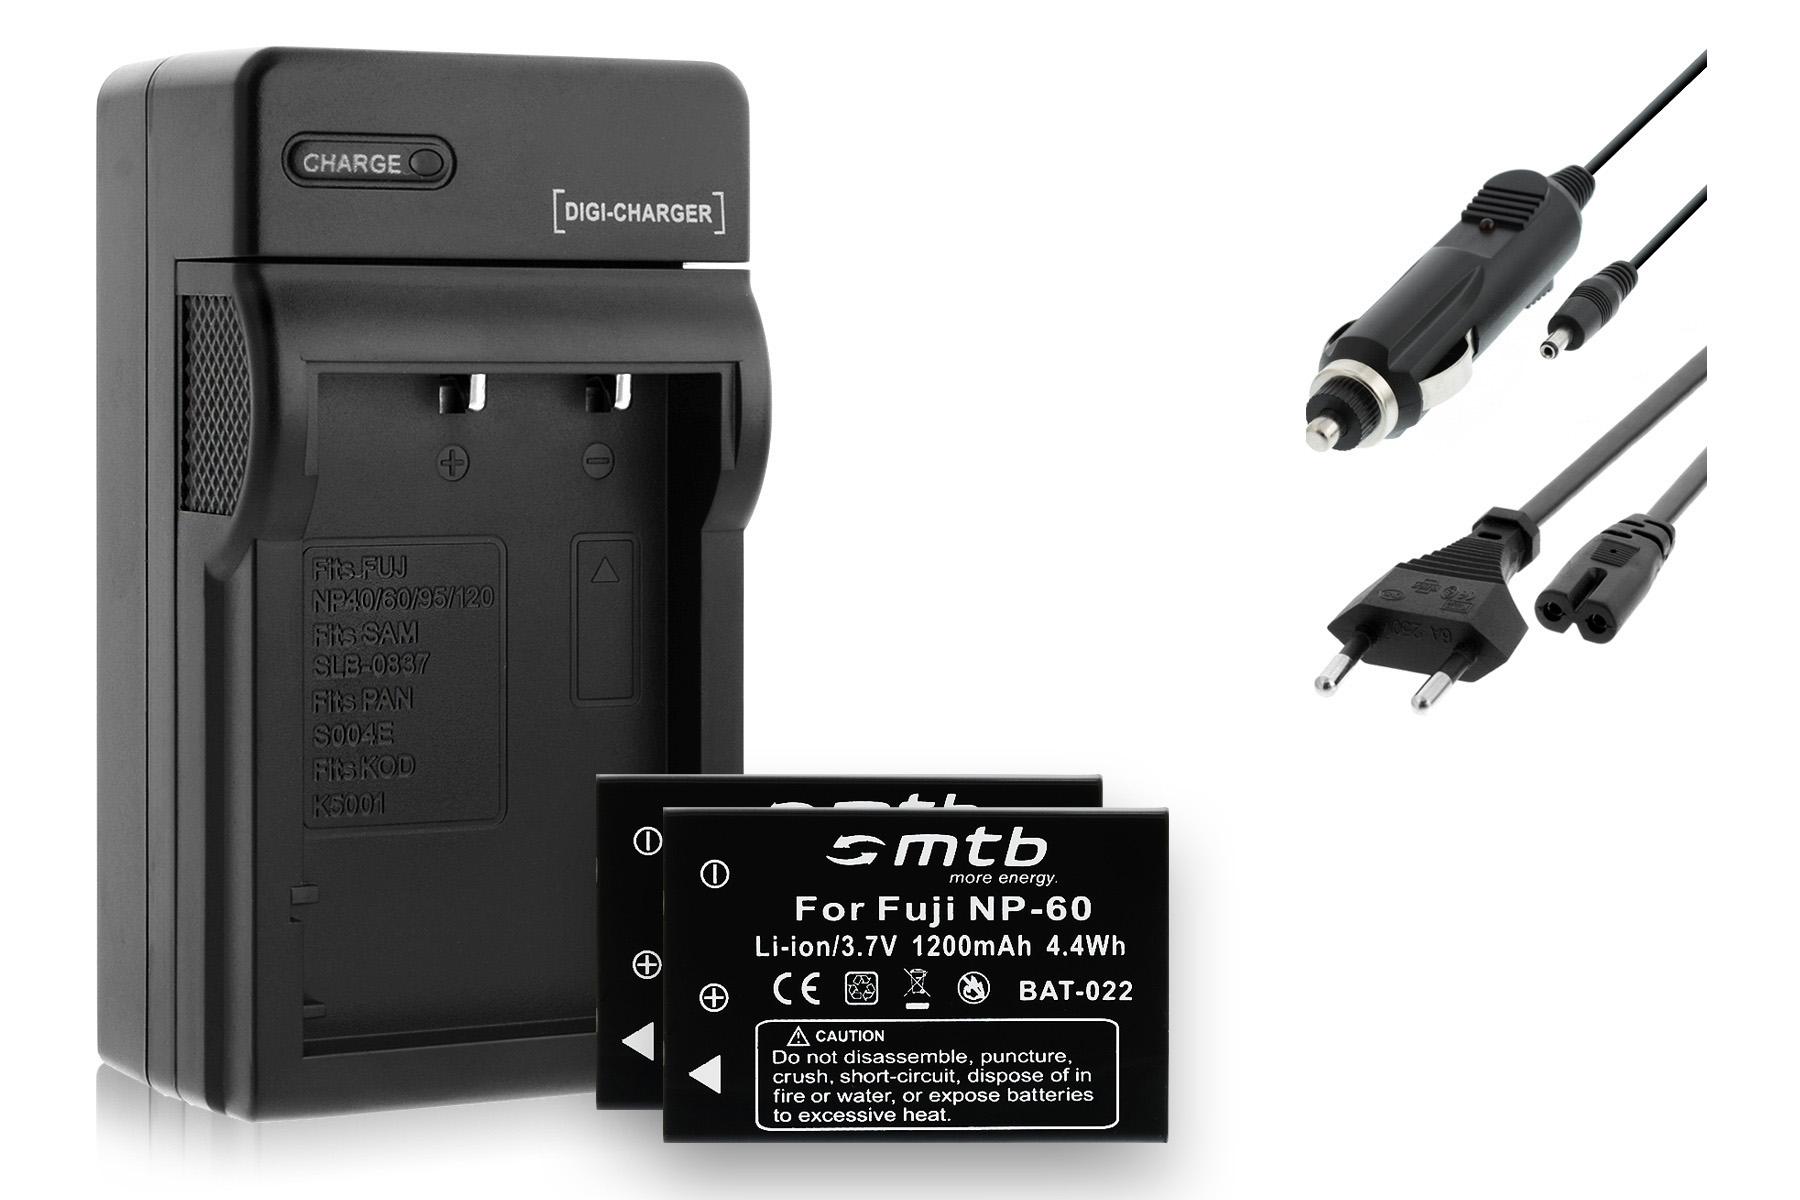 CAMCORDER AKKU-LADEGERÄT MICRO USB für Jay-Tech Videoshot DVH24